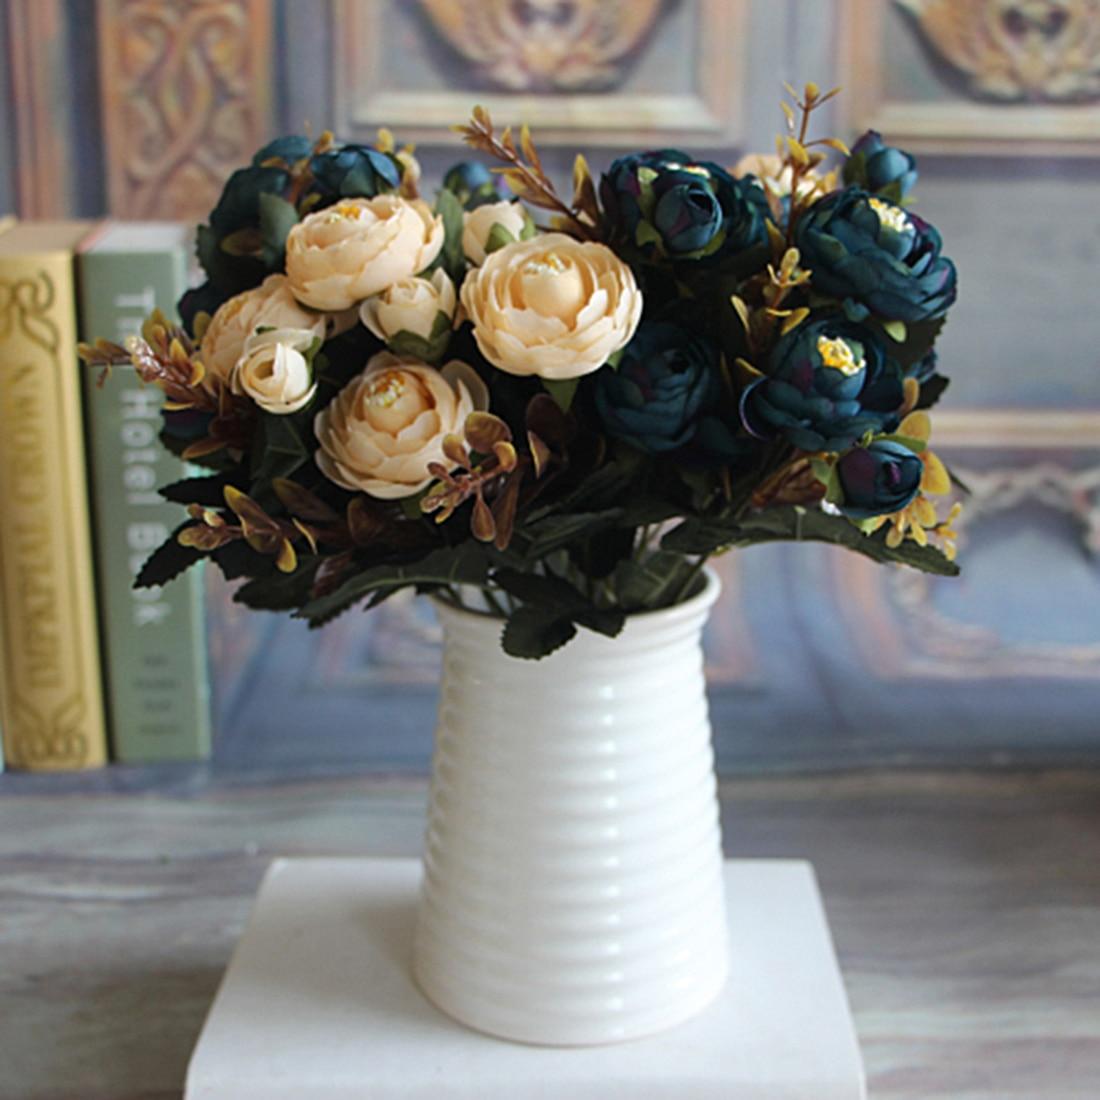 Encantadora vivo 6 sucursales otoño Peonías artificiales de imitación flor casa habitación decoración de hortensias de boda Real Touch